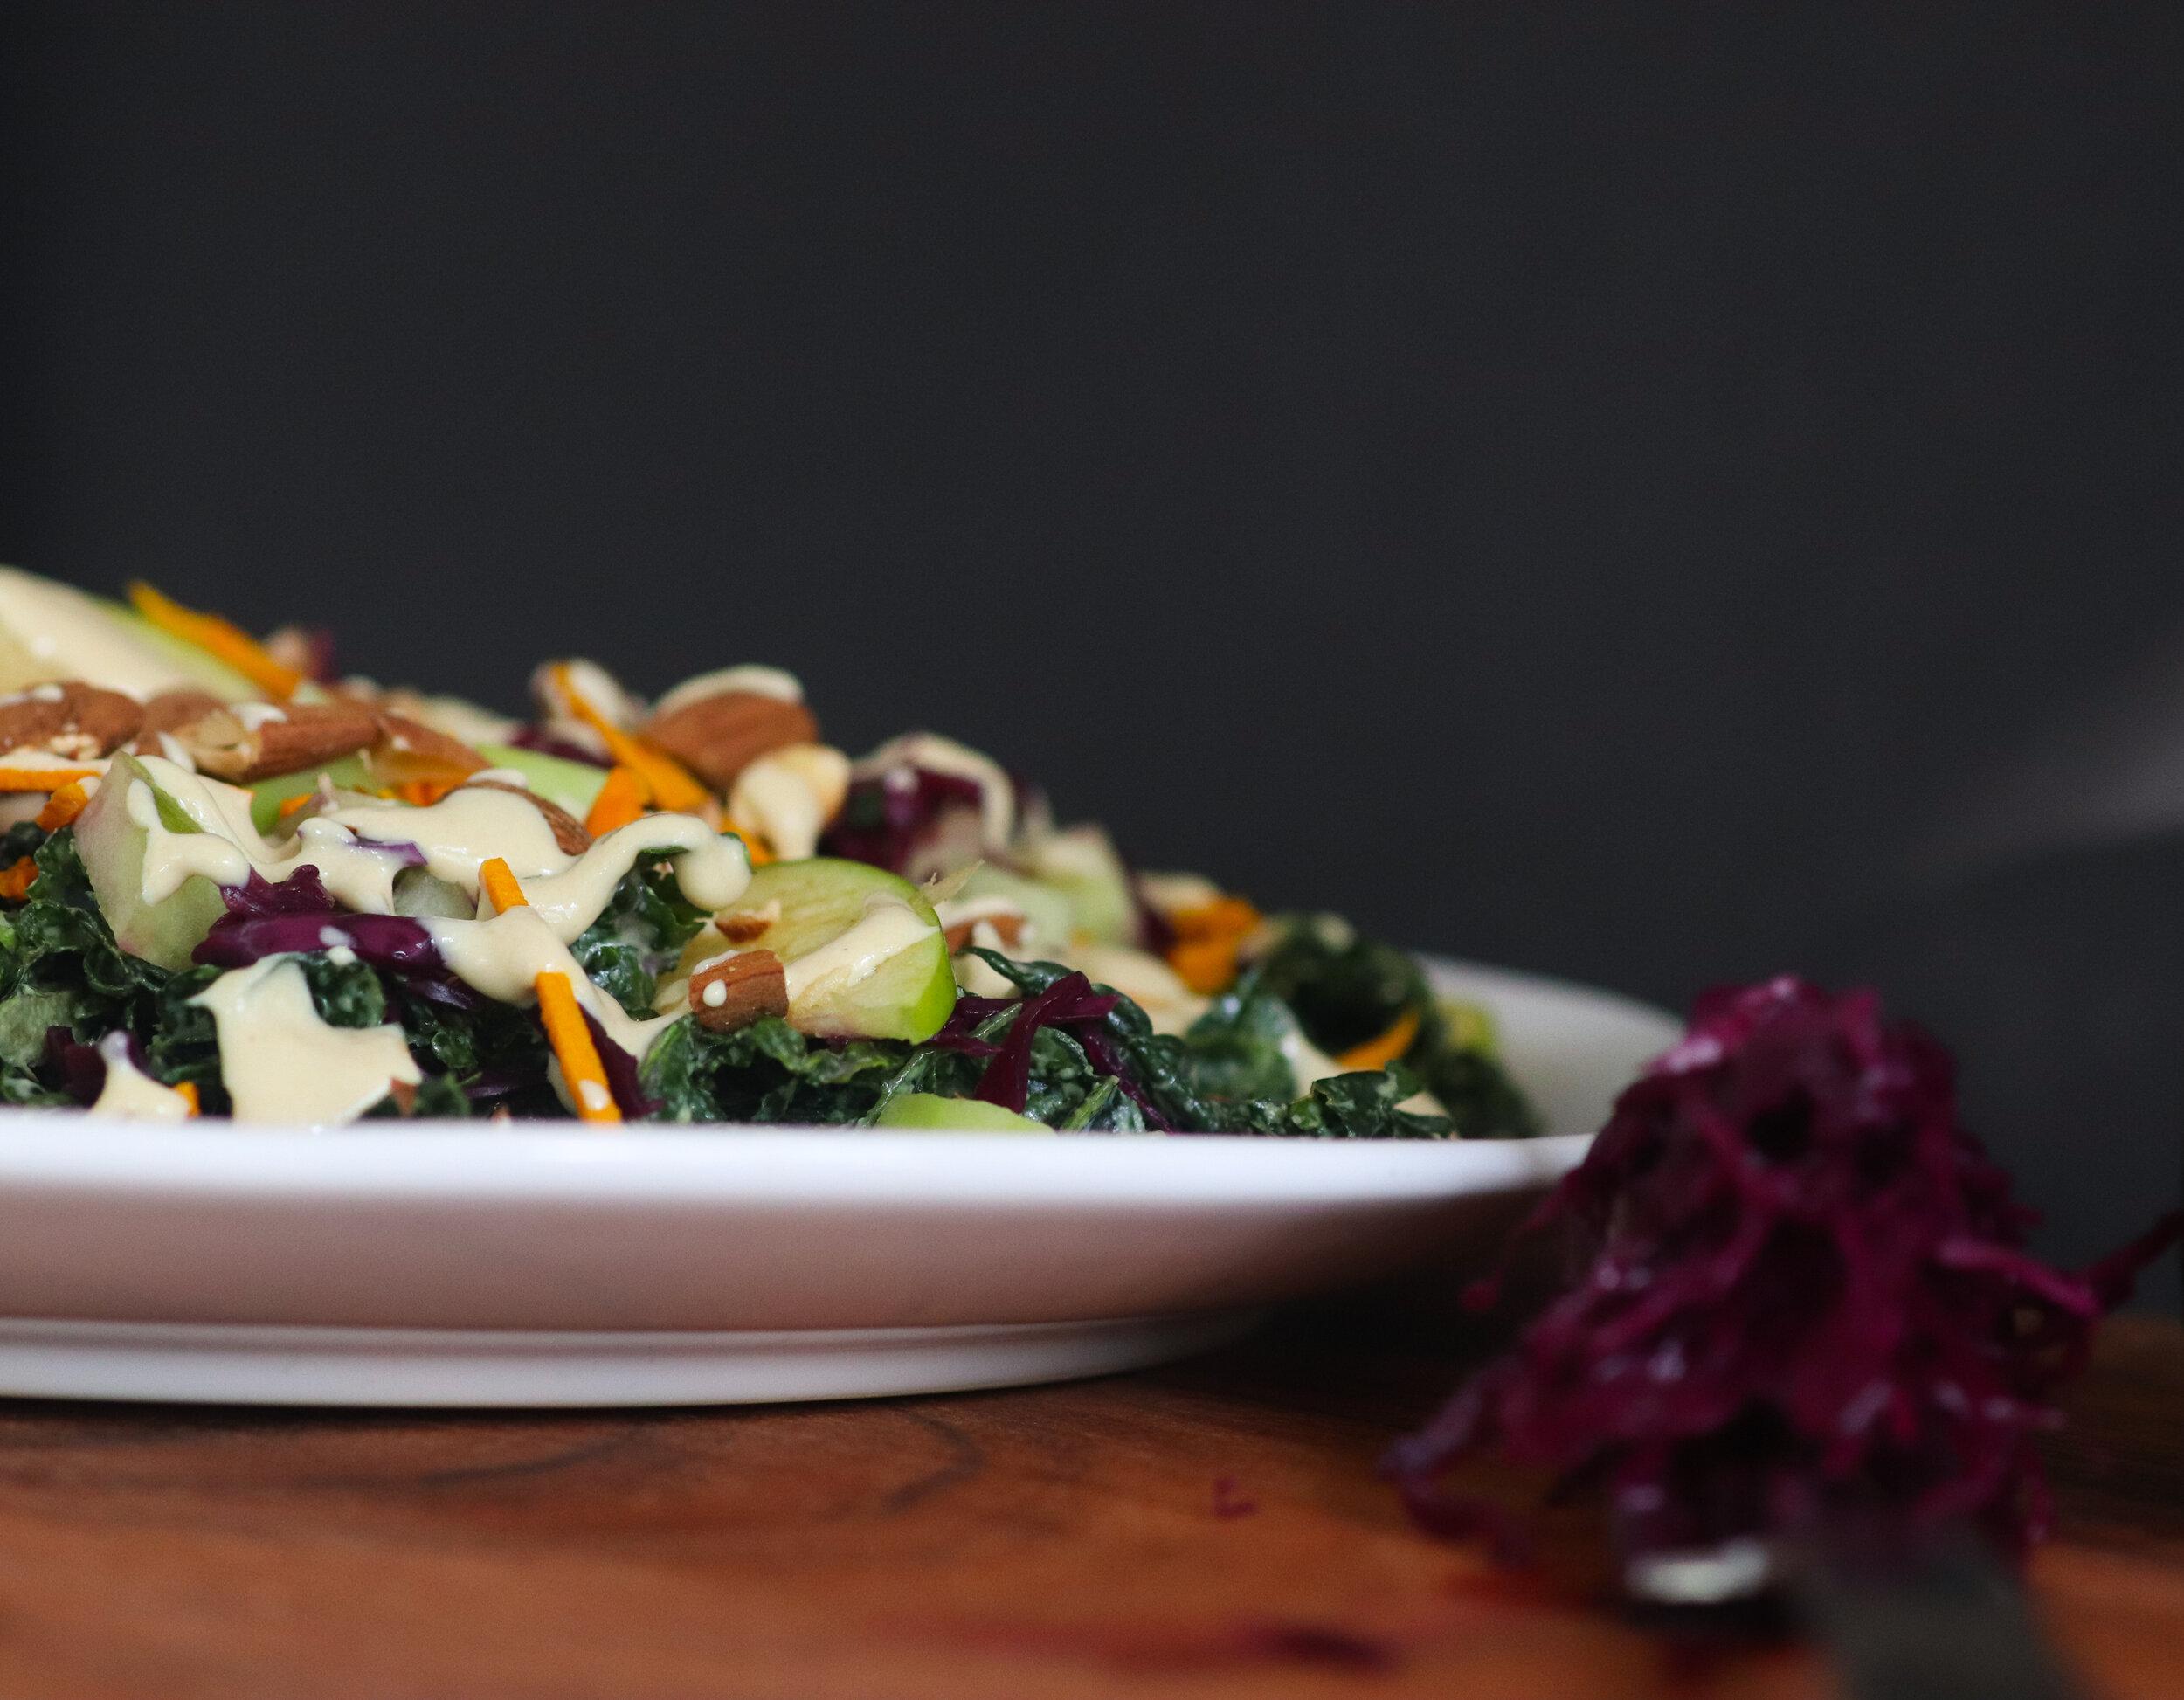 plant based, vegan, gluten free, oil free, tahini dressing, kale and apple salad, saurkraut, tumeric.jpg